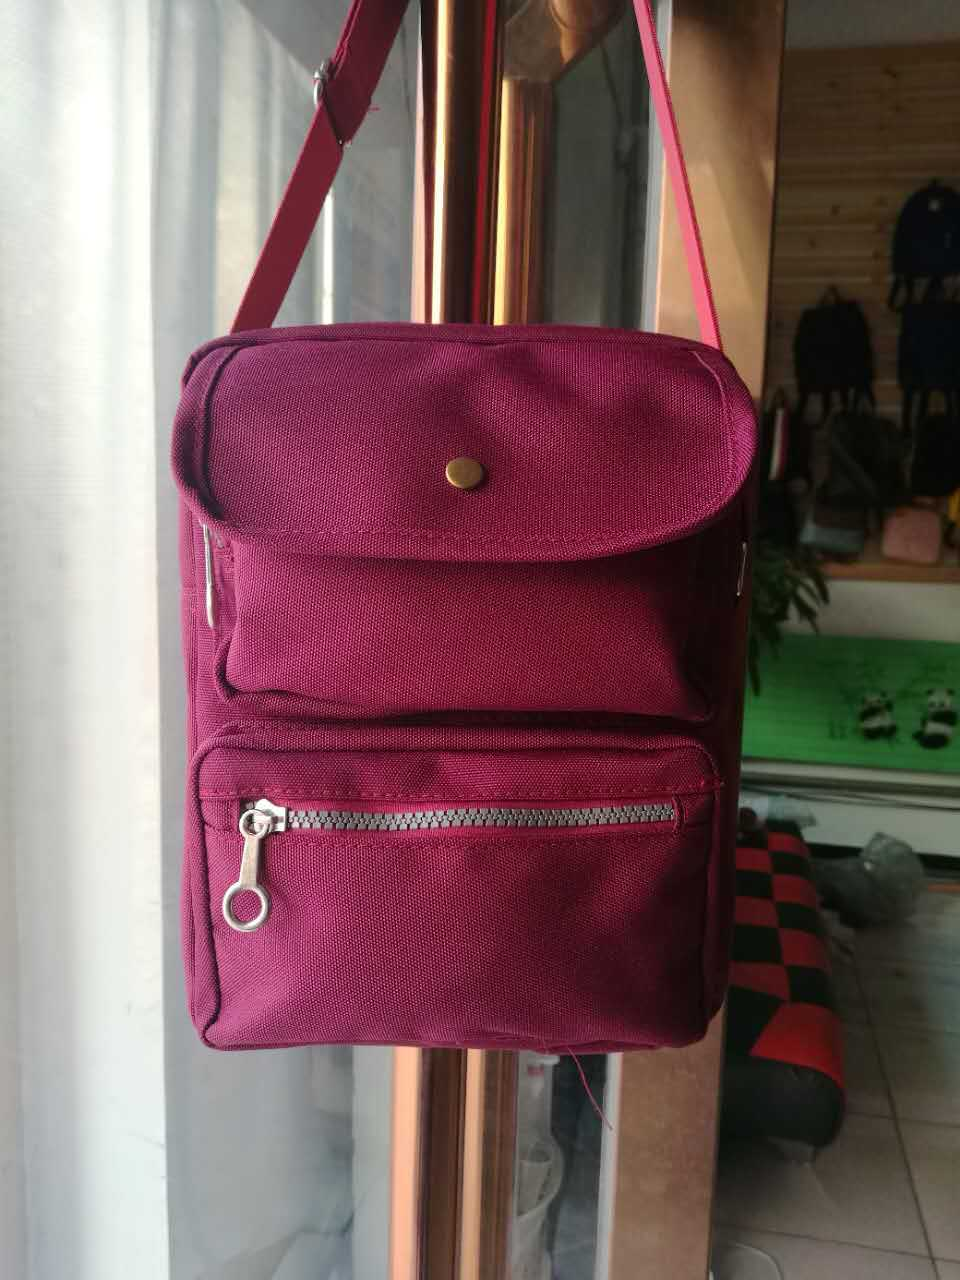 Oxford Cloth Bag Fashion Multi-Function Women's Bag Shoulder Cross-Body Small Bag Elegant Women's Small Square Bag